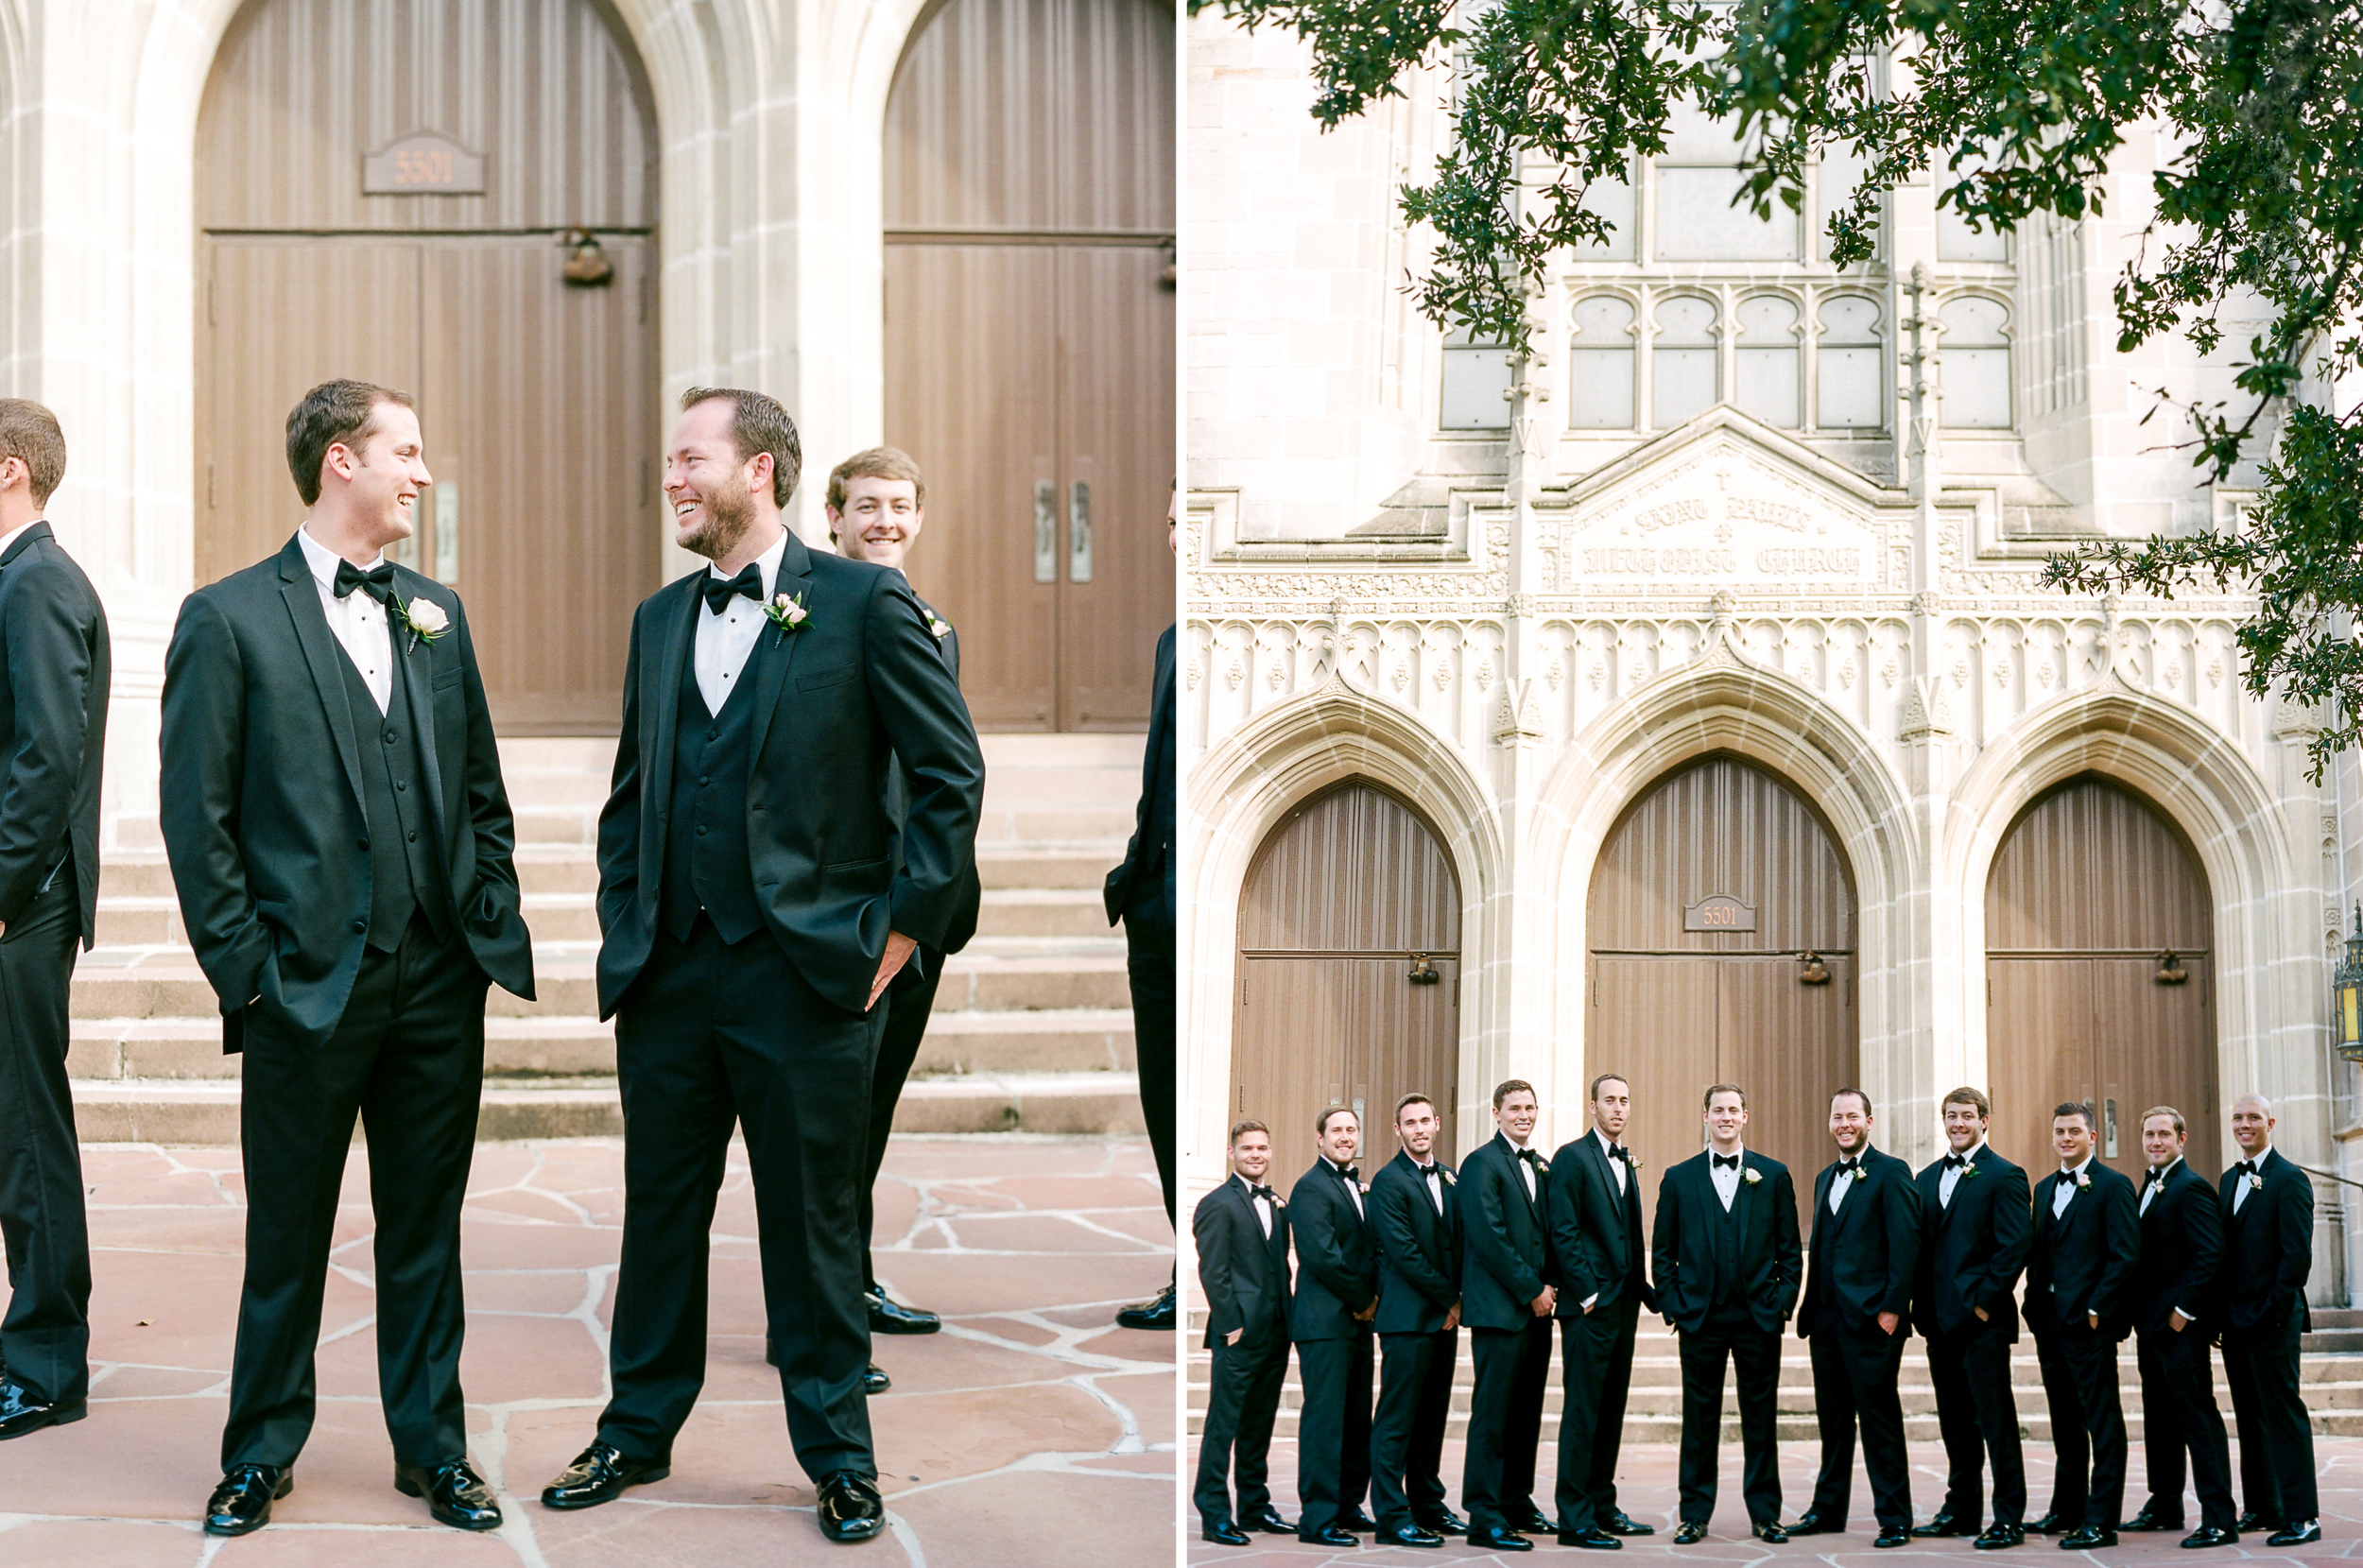 Dana-Fernandez-Photography-Weddings-in-Houston-Magazine-feature-Houston-wedding-photographer-film-126.jpg